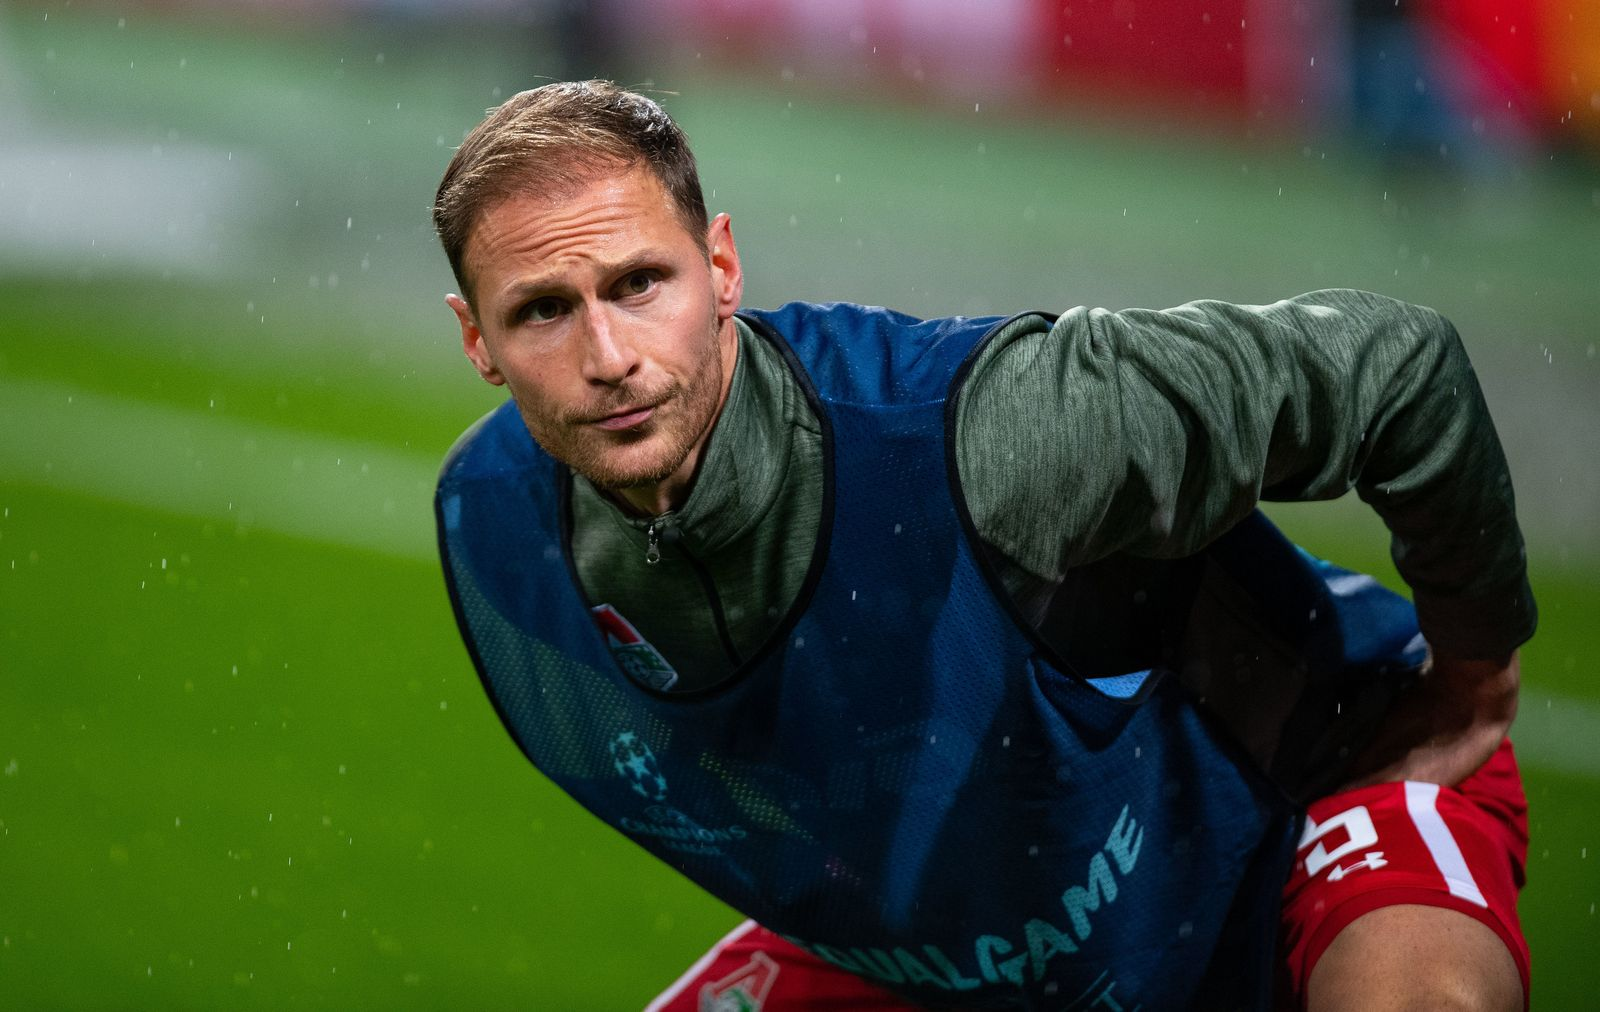 Fußball: Champions League, Lokomotive Moskau - FC Schalke 04